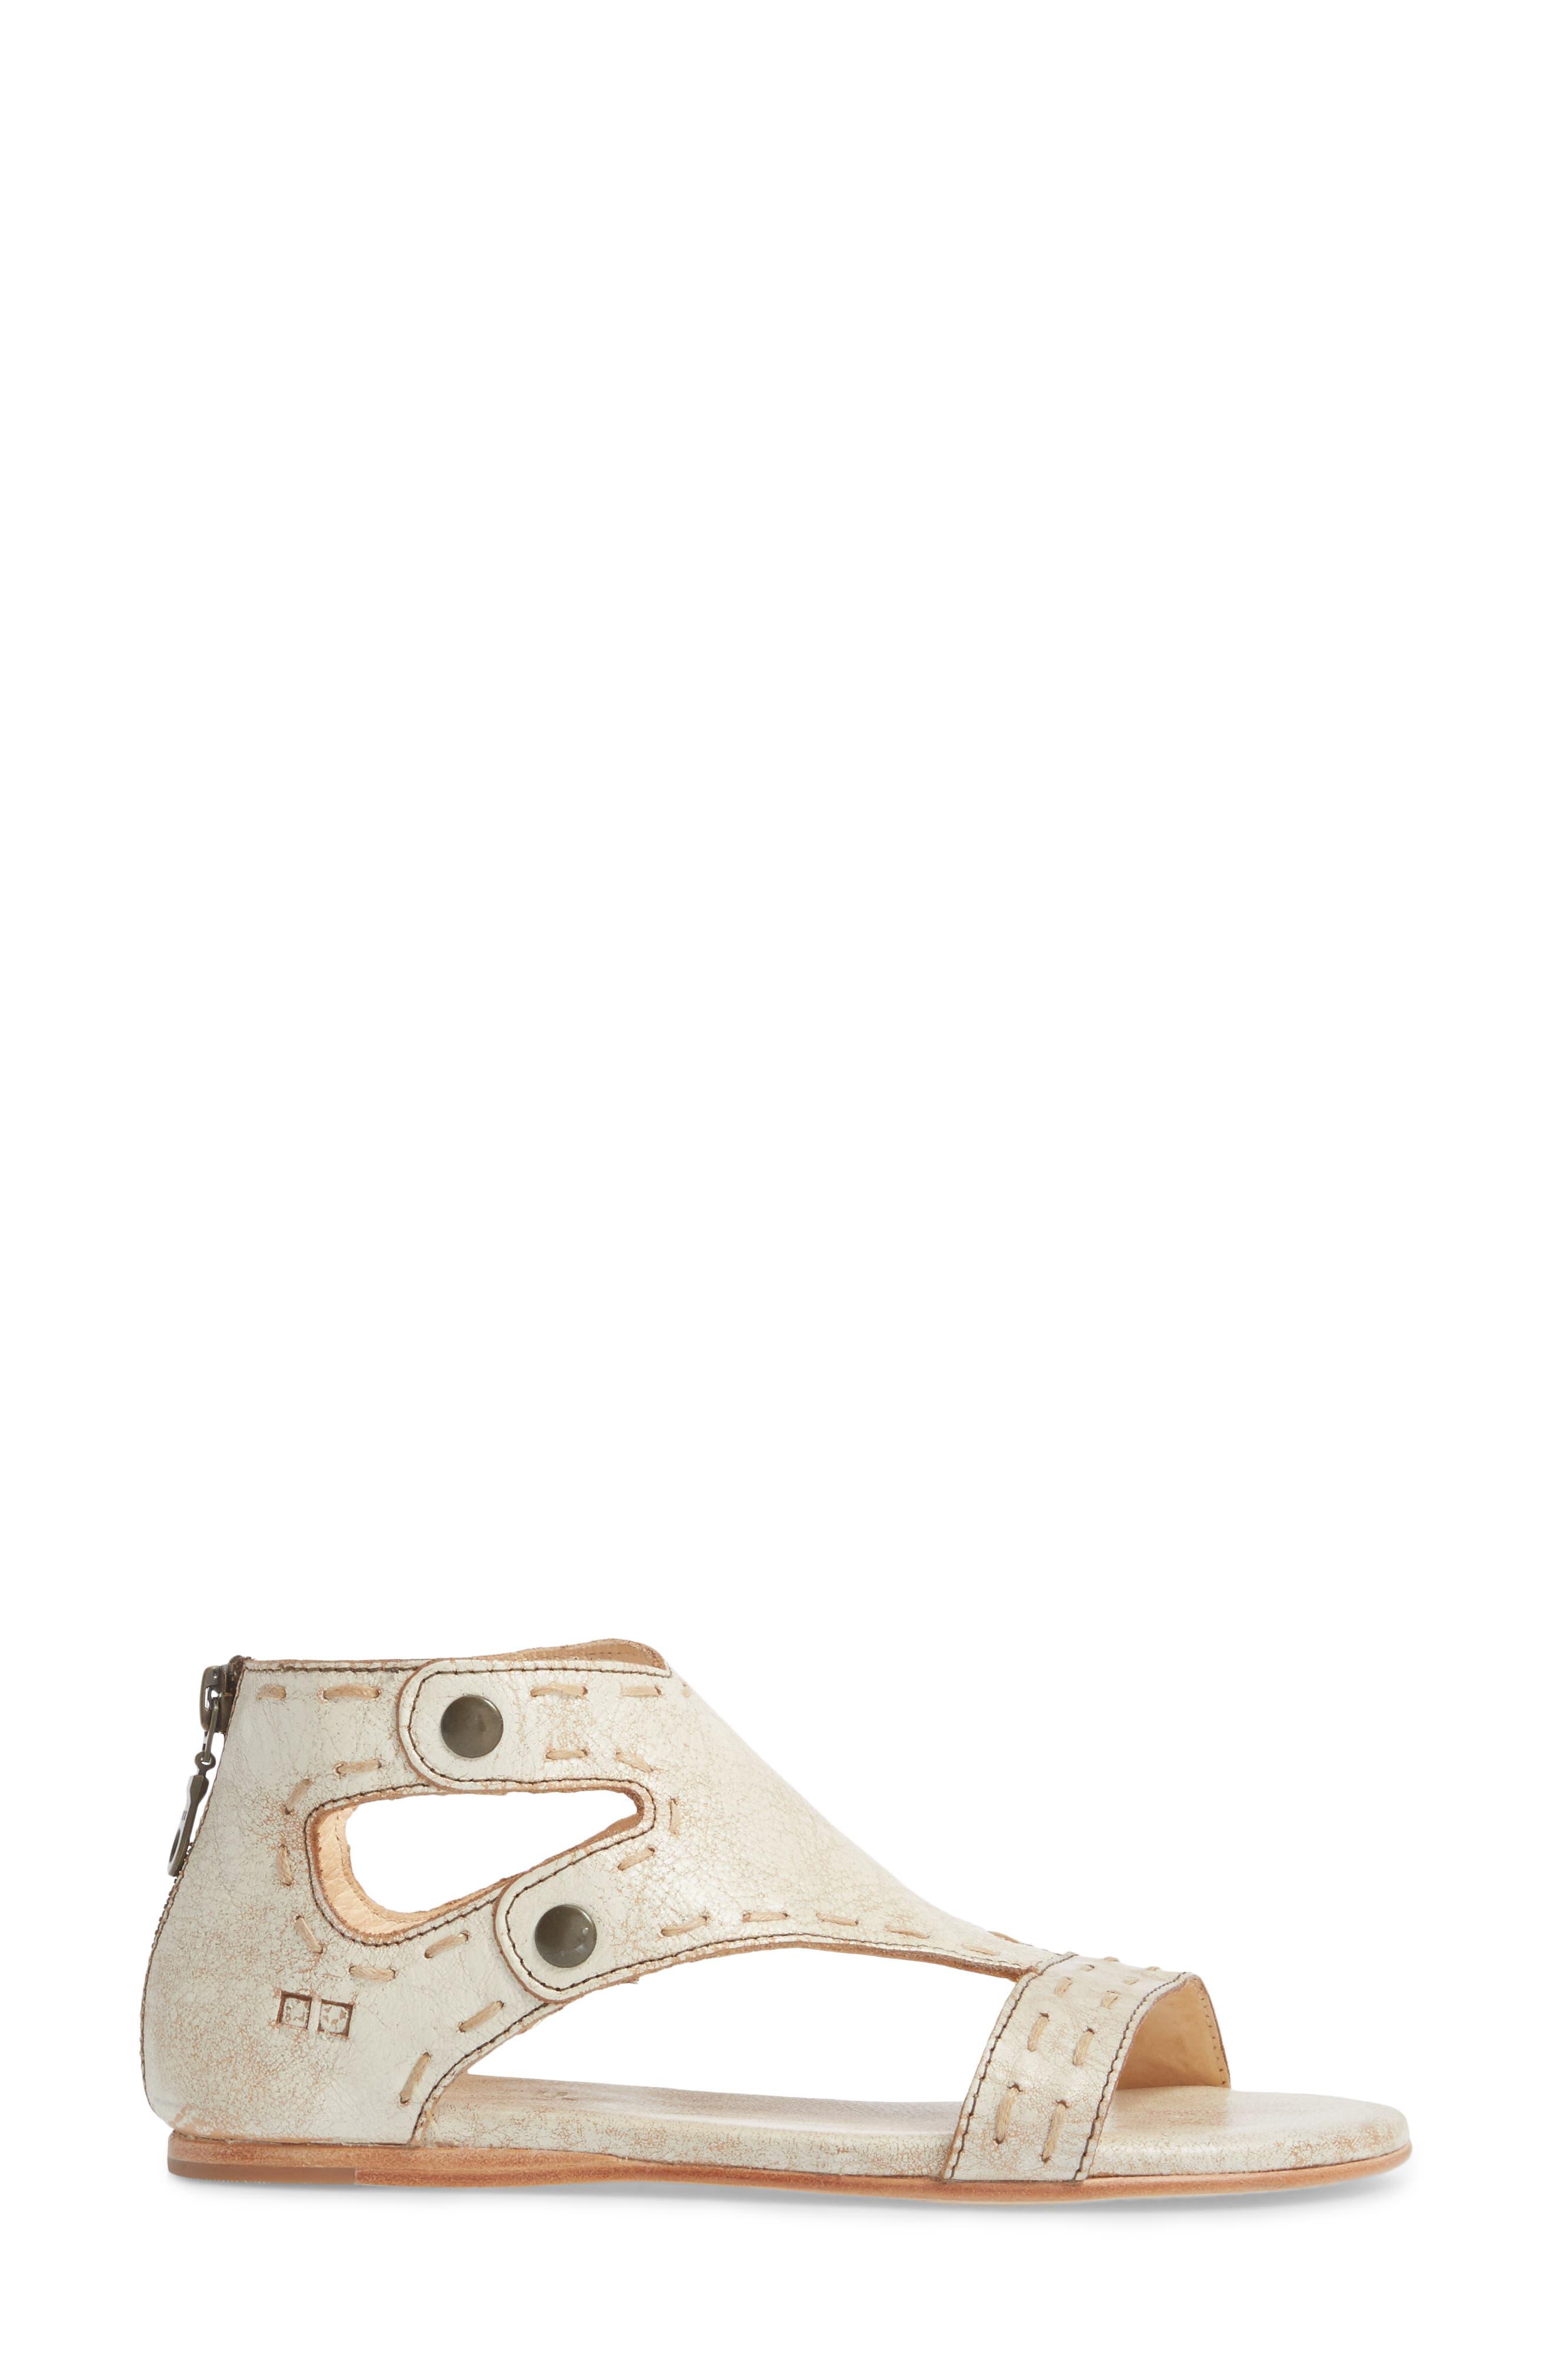 Soto Sandal,                             Alternate thumbnail 3, color,                             Nectar Leather